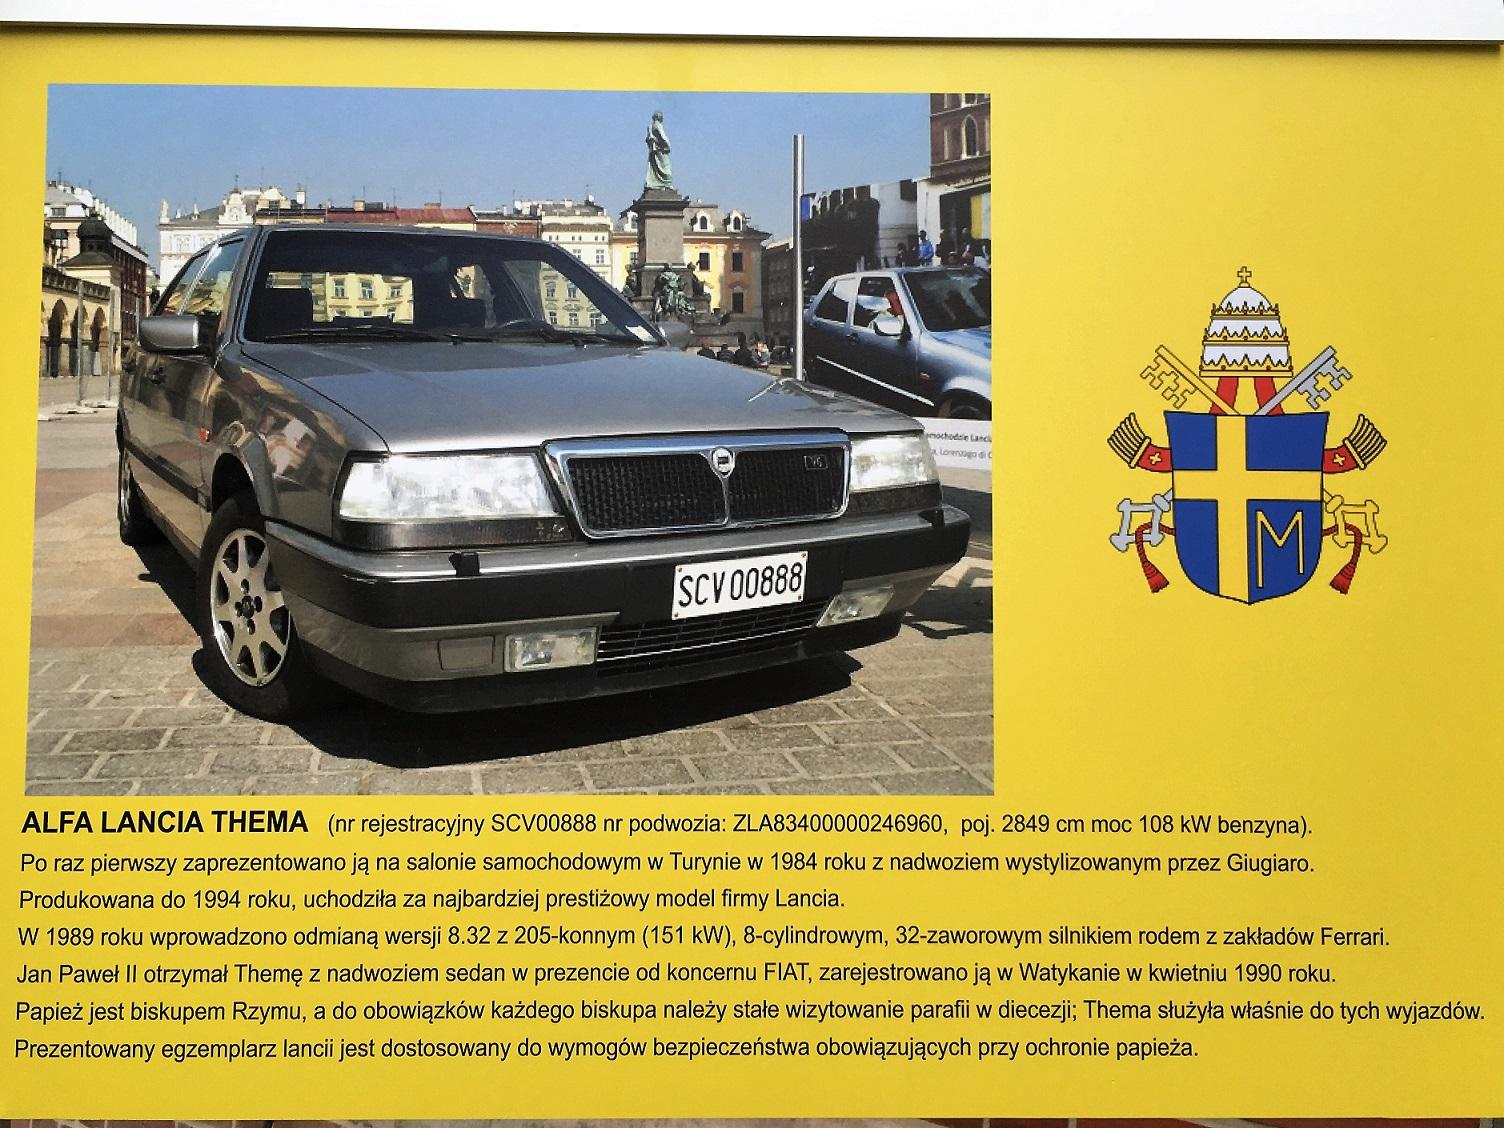 Alfa Lancia Thema